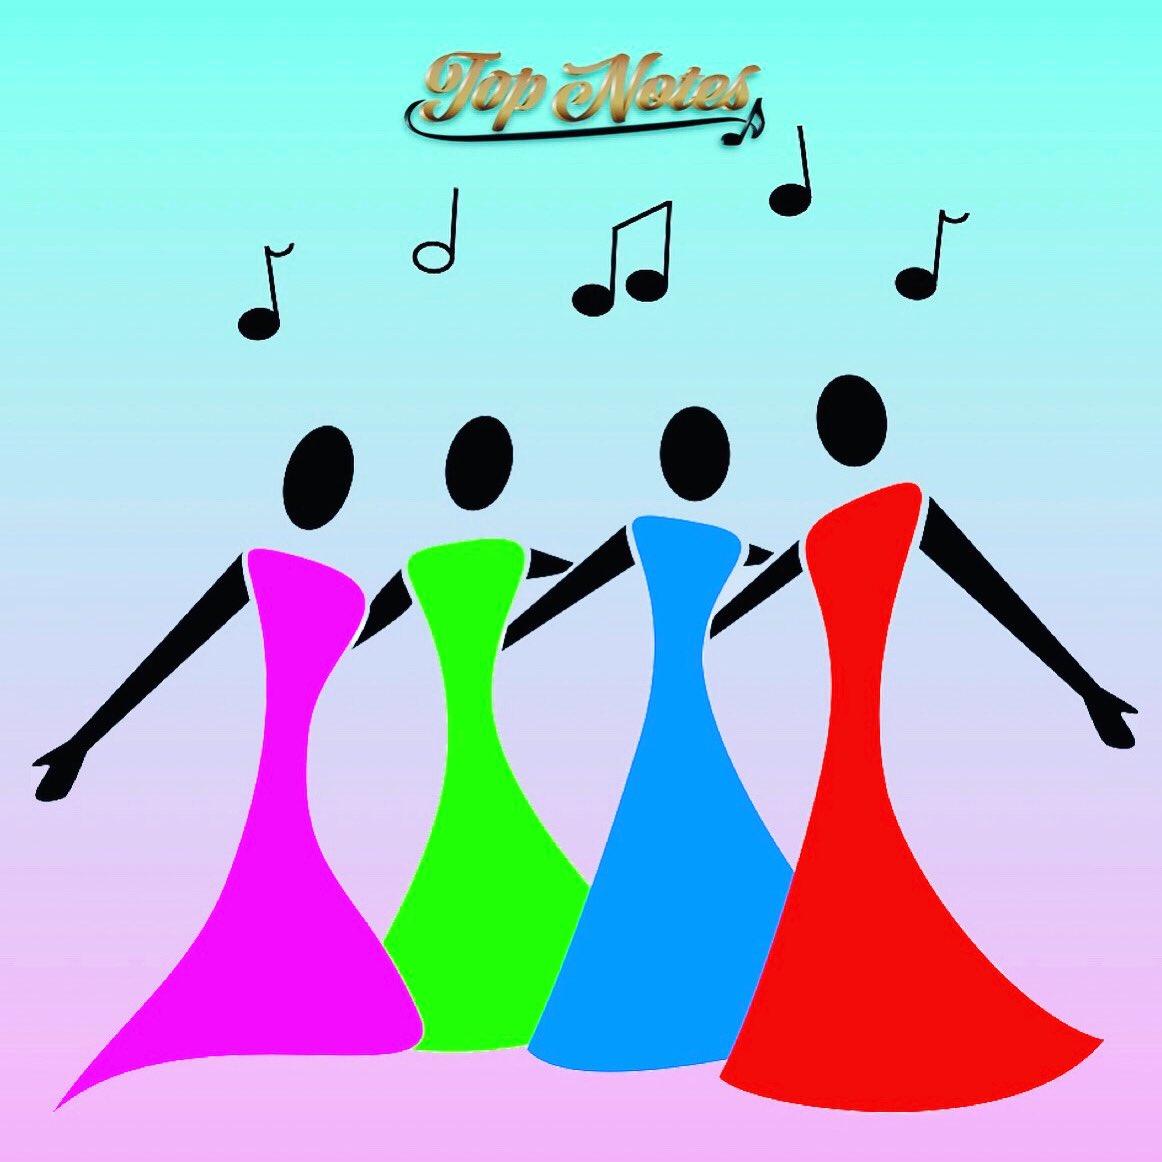 BACK TO REHEARSALS TONIGHT!!! 🎶  #topnoteschoir #femalechoir #choirsarethebest #community #singingisgoodforthesoul #ifindoubtsing #musicislife #soprano #mezzo #alto #singsingsing https://t.co/WuSU8bHsjq